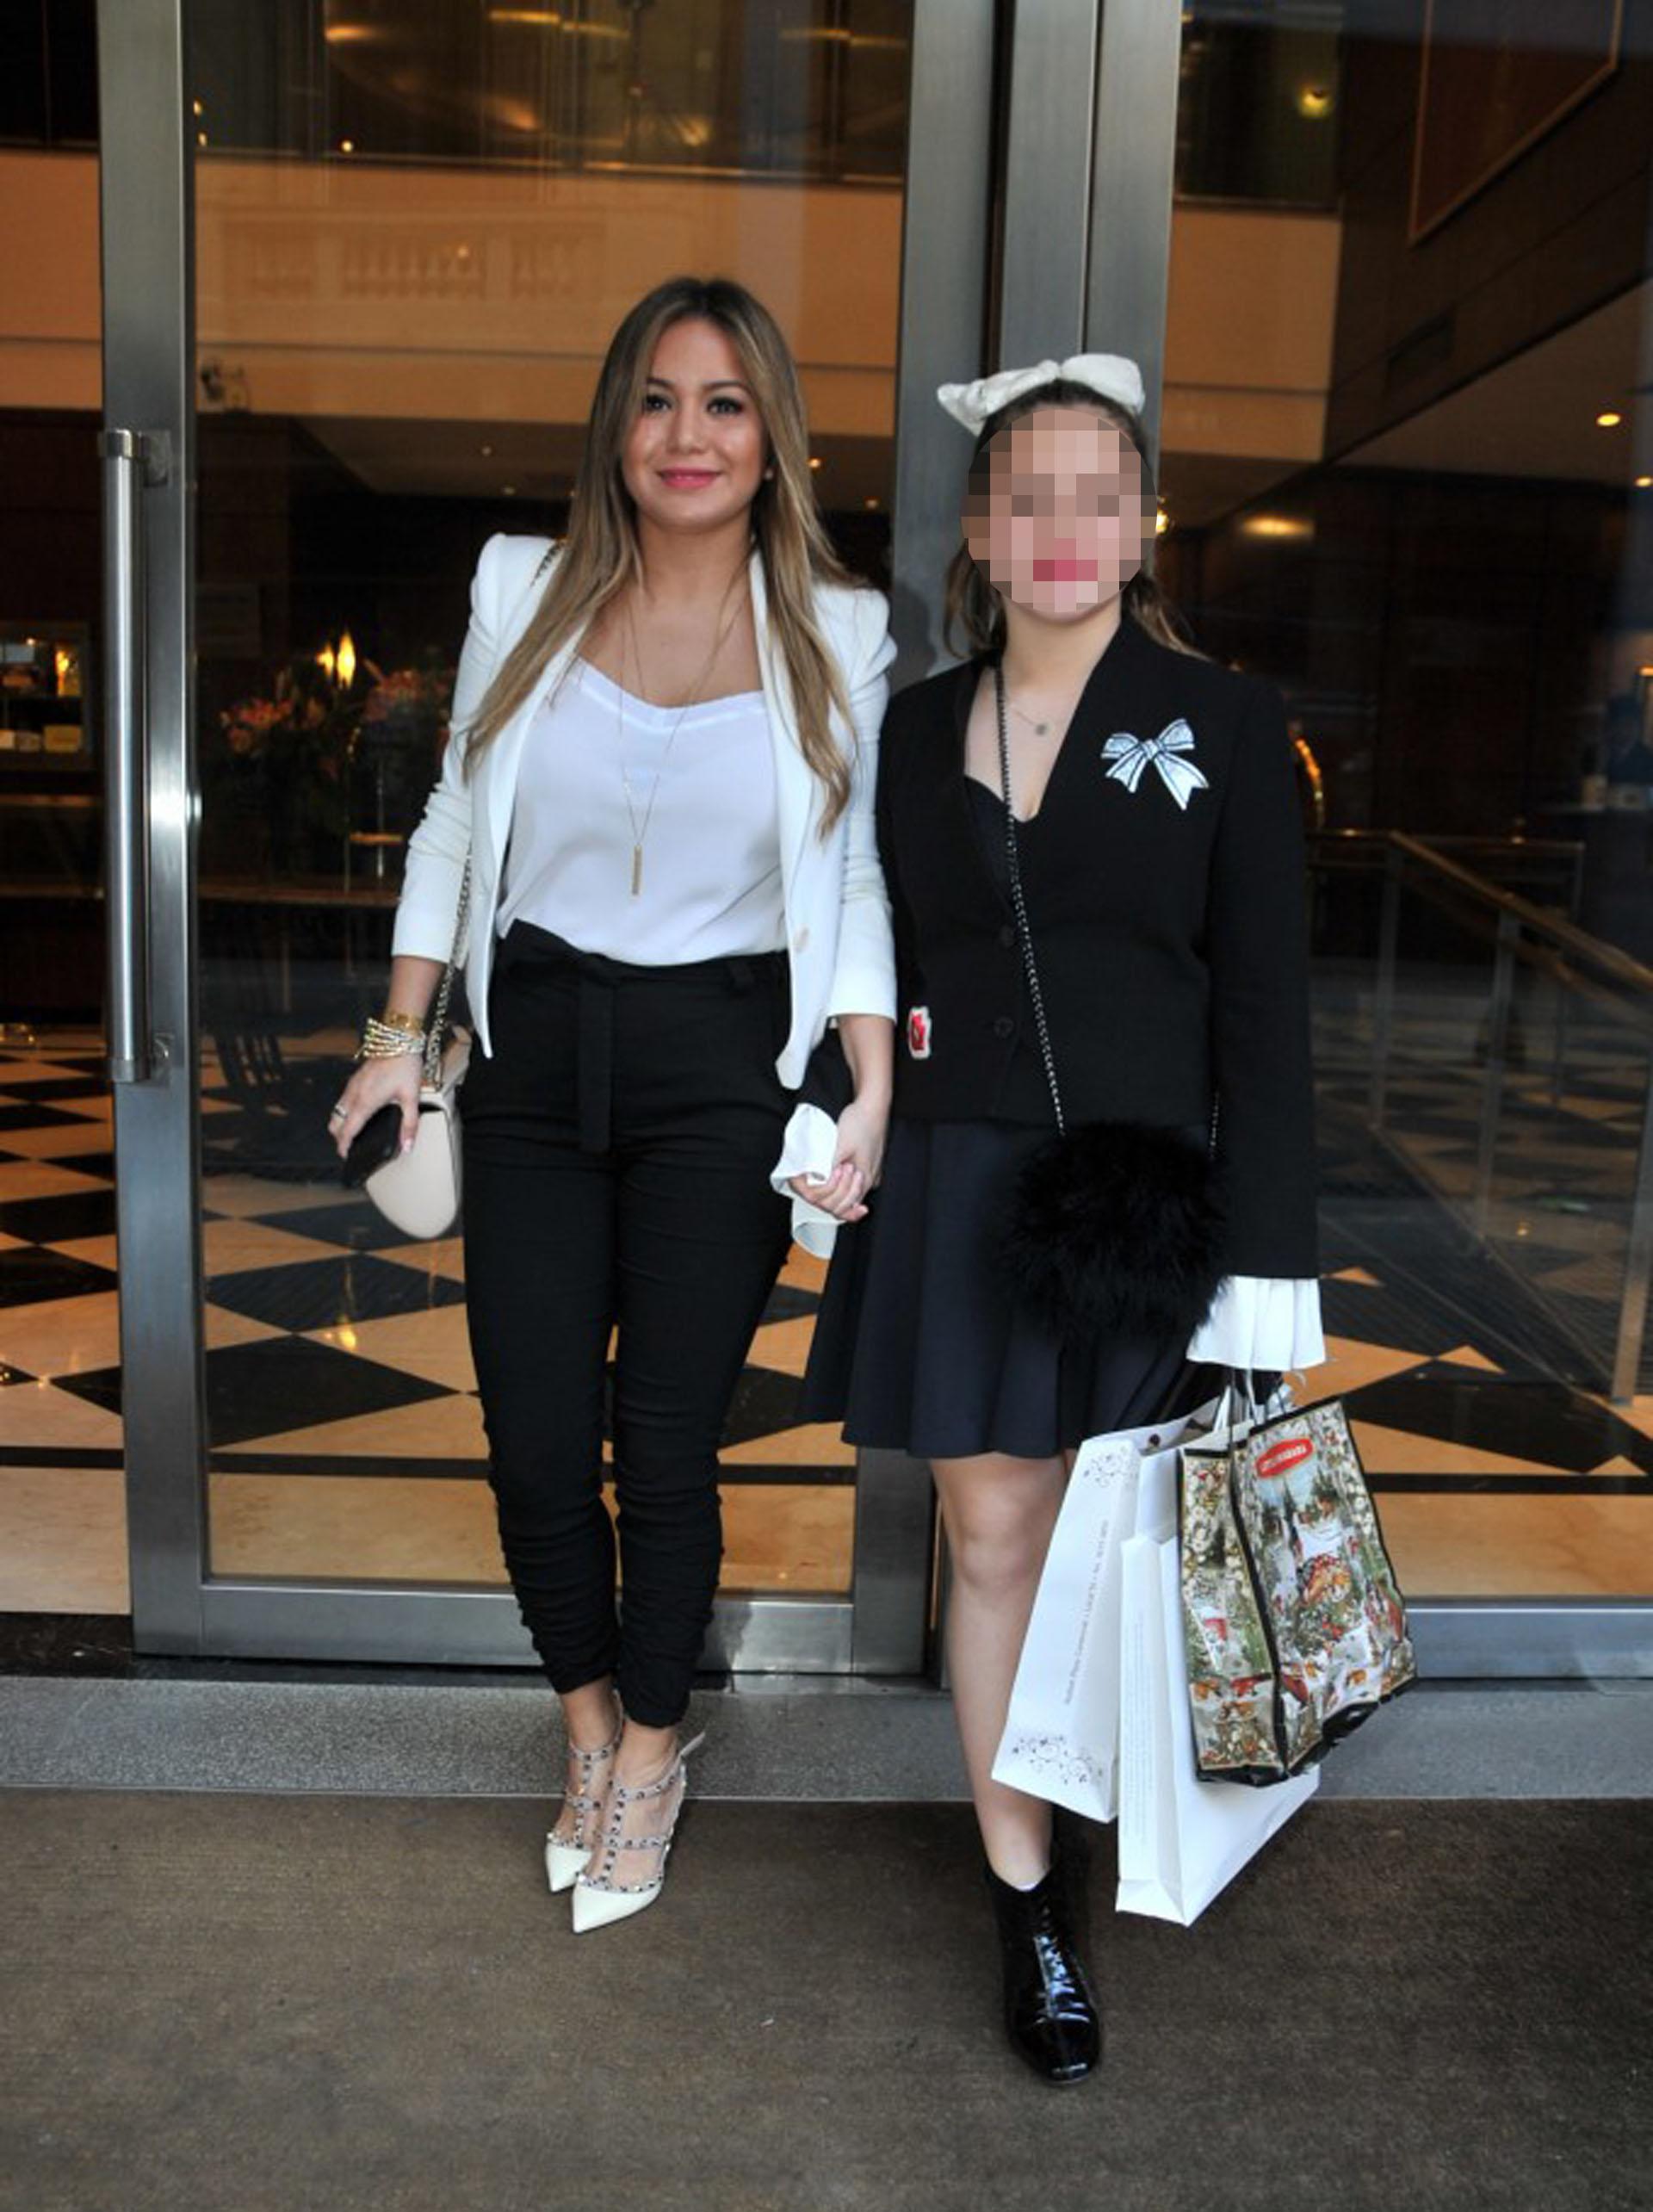 Karina La Princesita y su hija, Sol